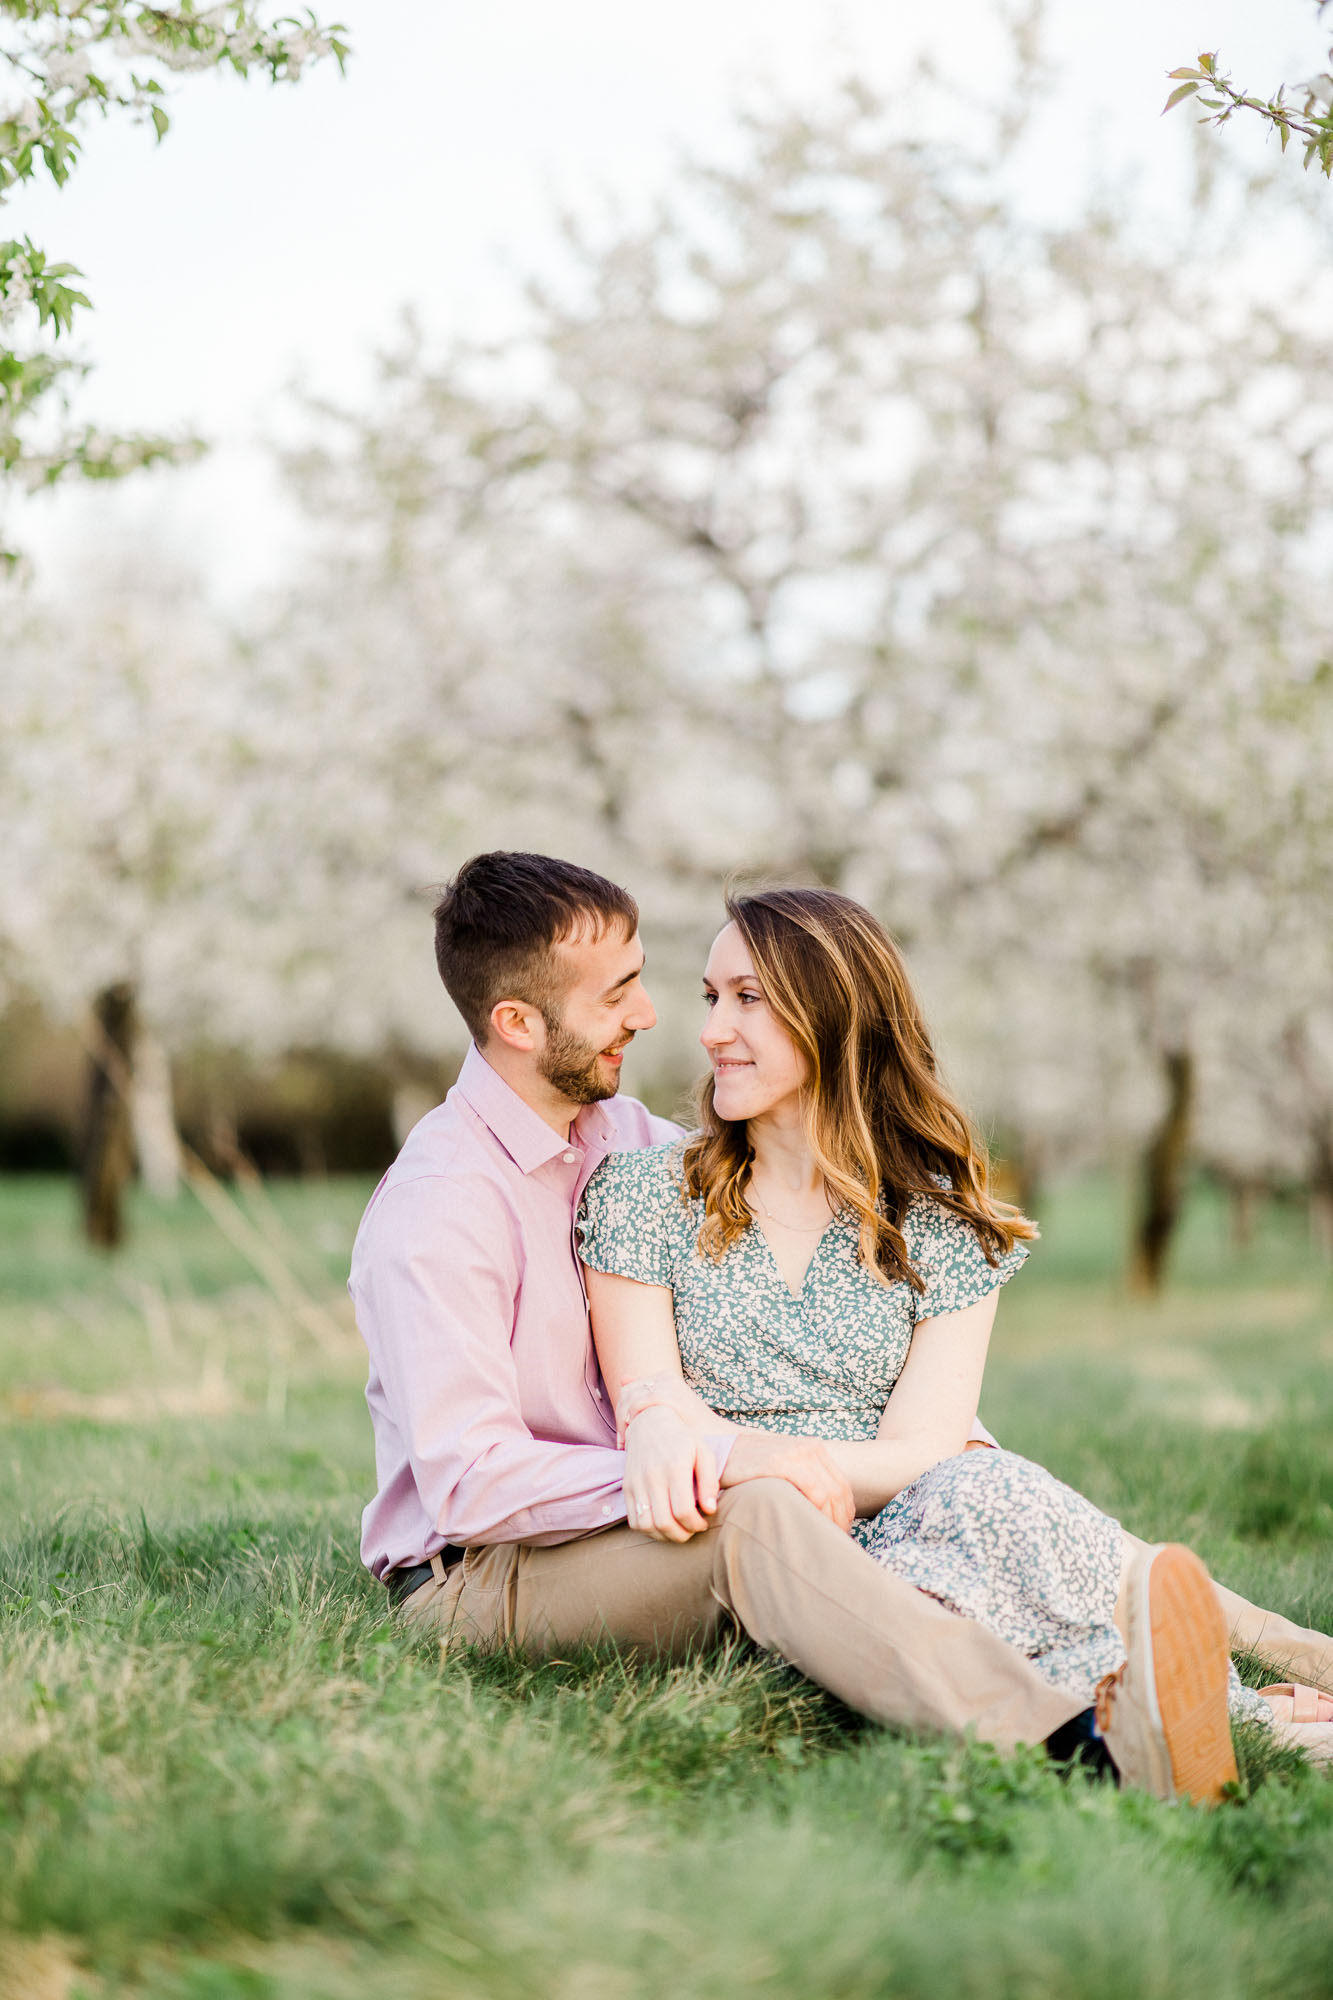 Rohrbachs-Spring-cherry-blossom-engagement-7754.jpg